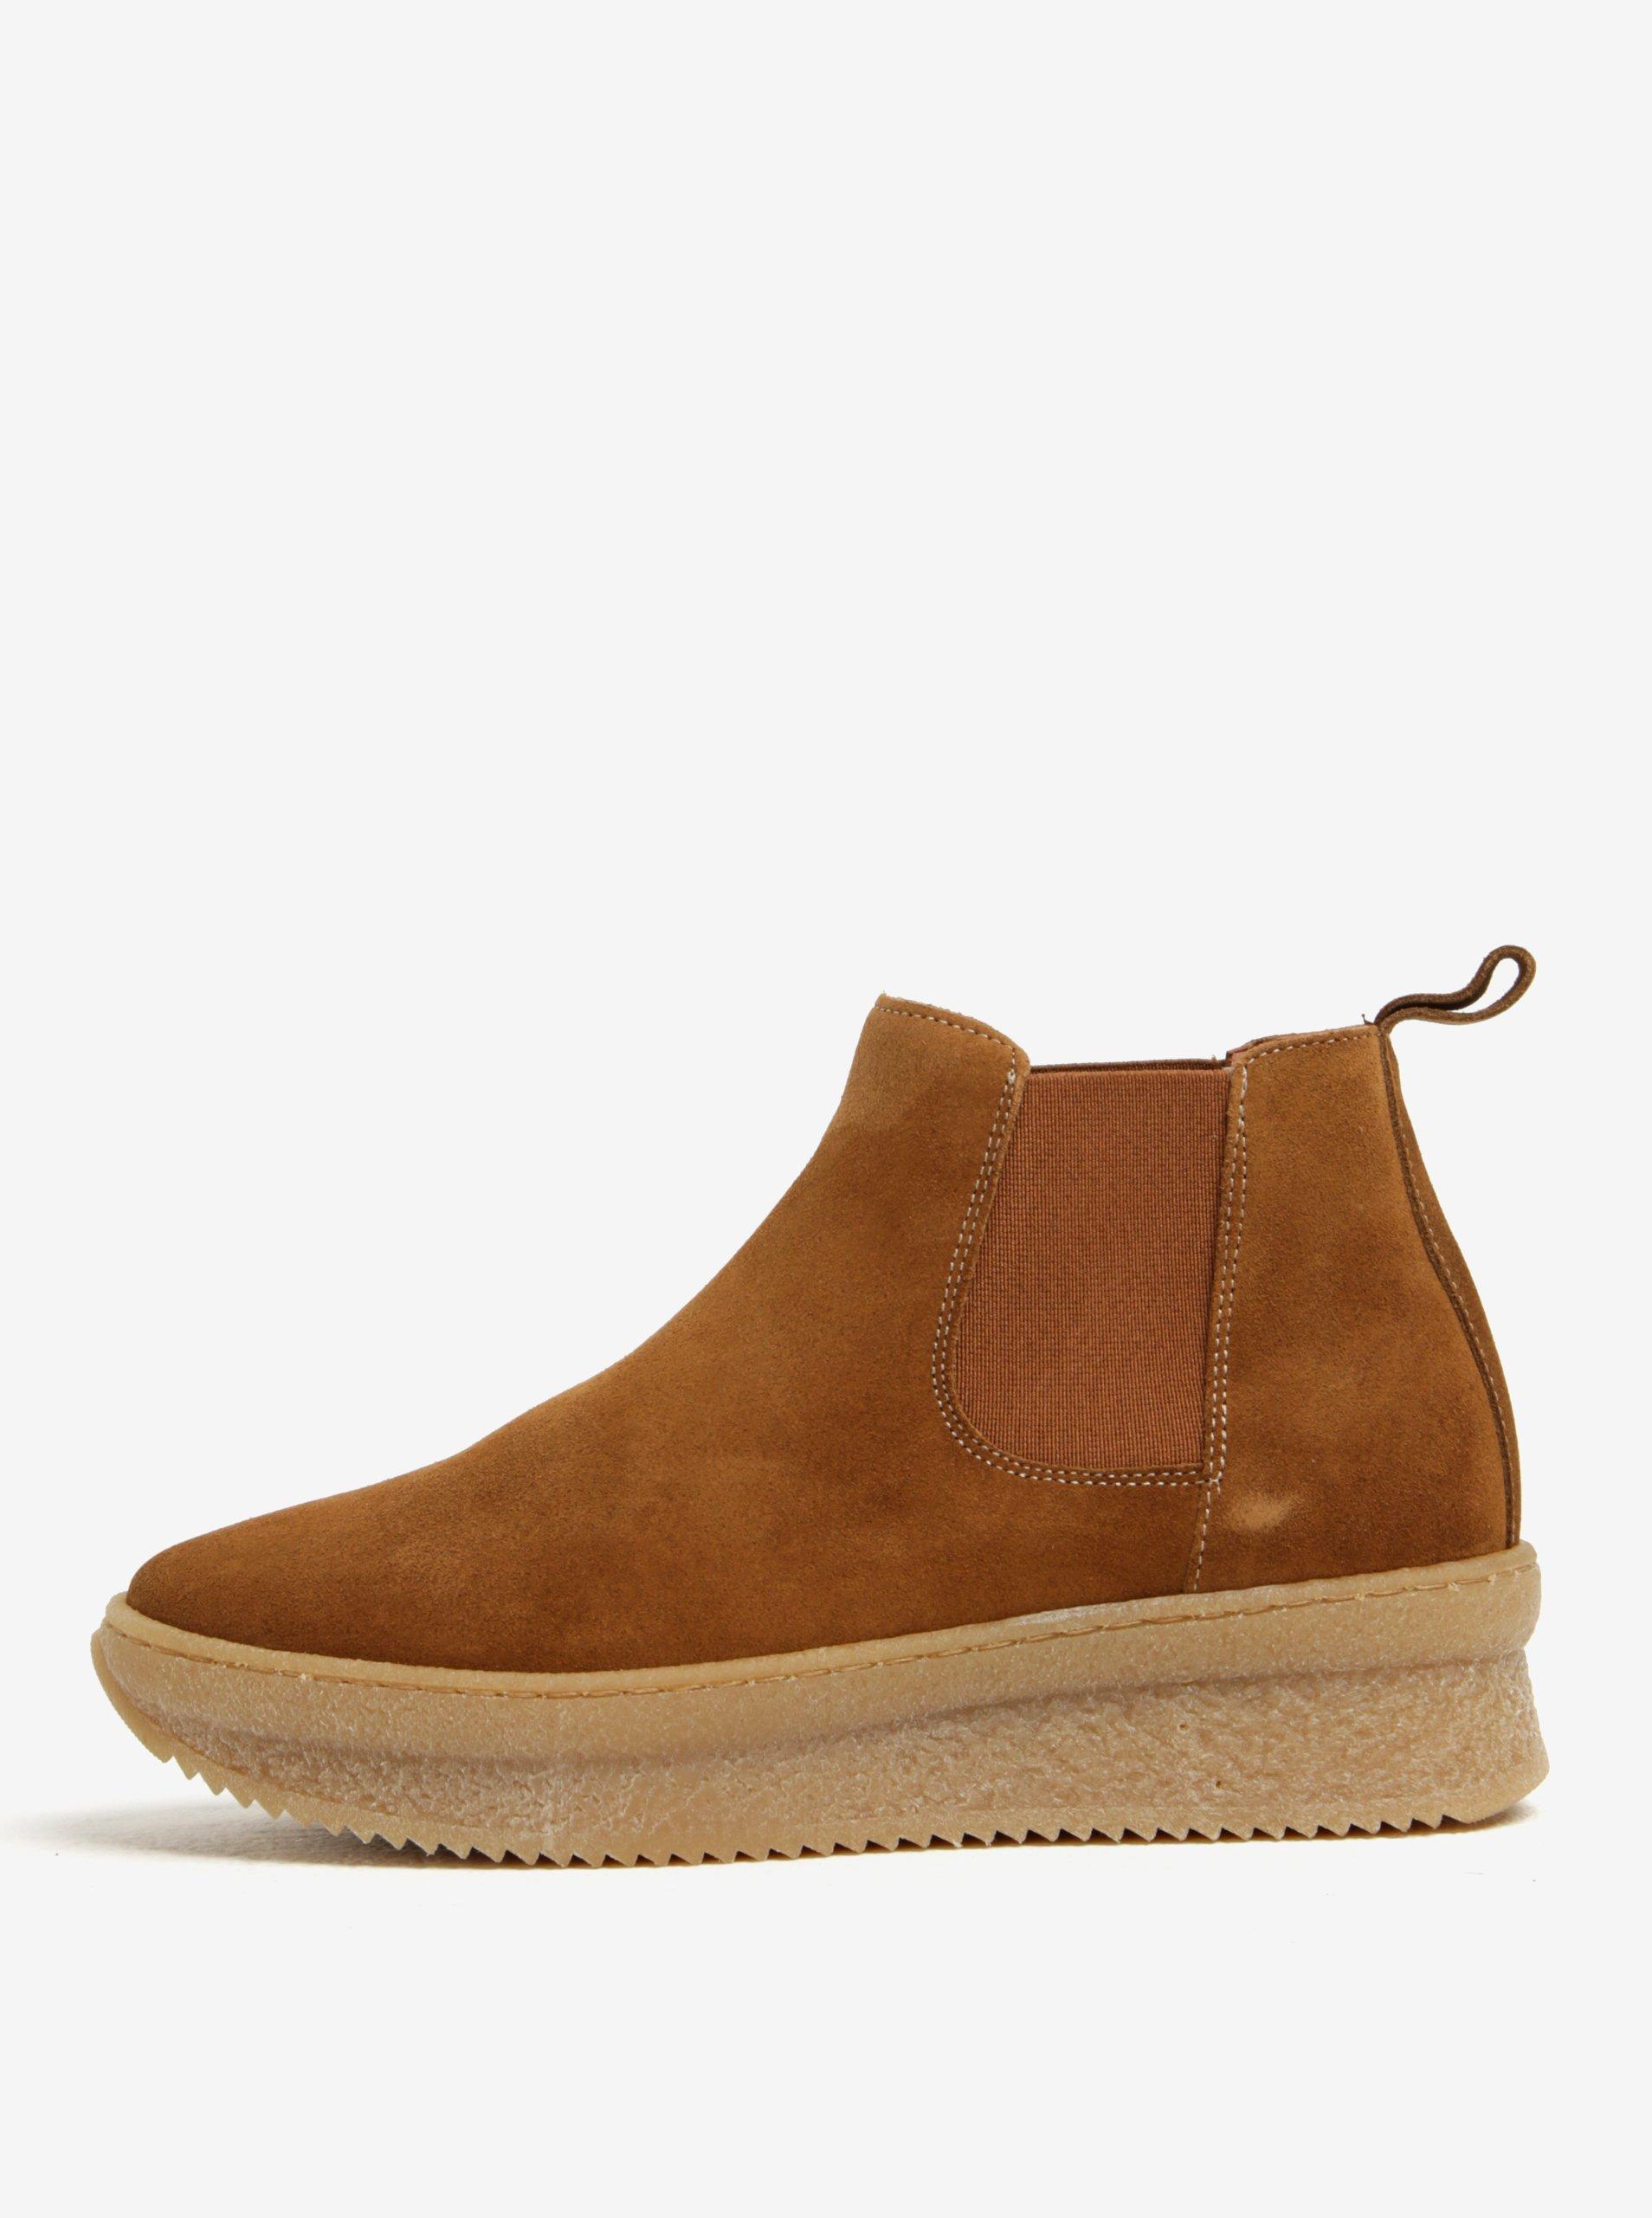 ae7402bc862d Hnedé semišové chelsea topánky na platforme OJJU